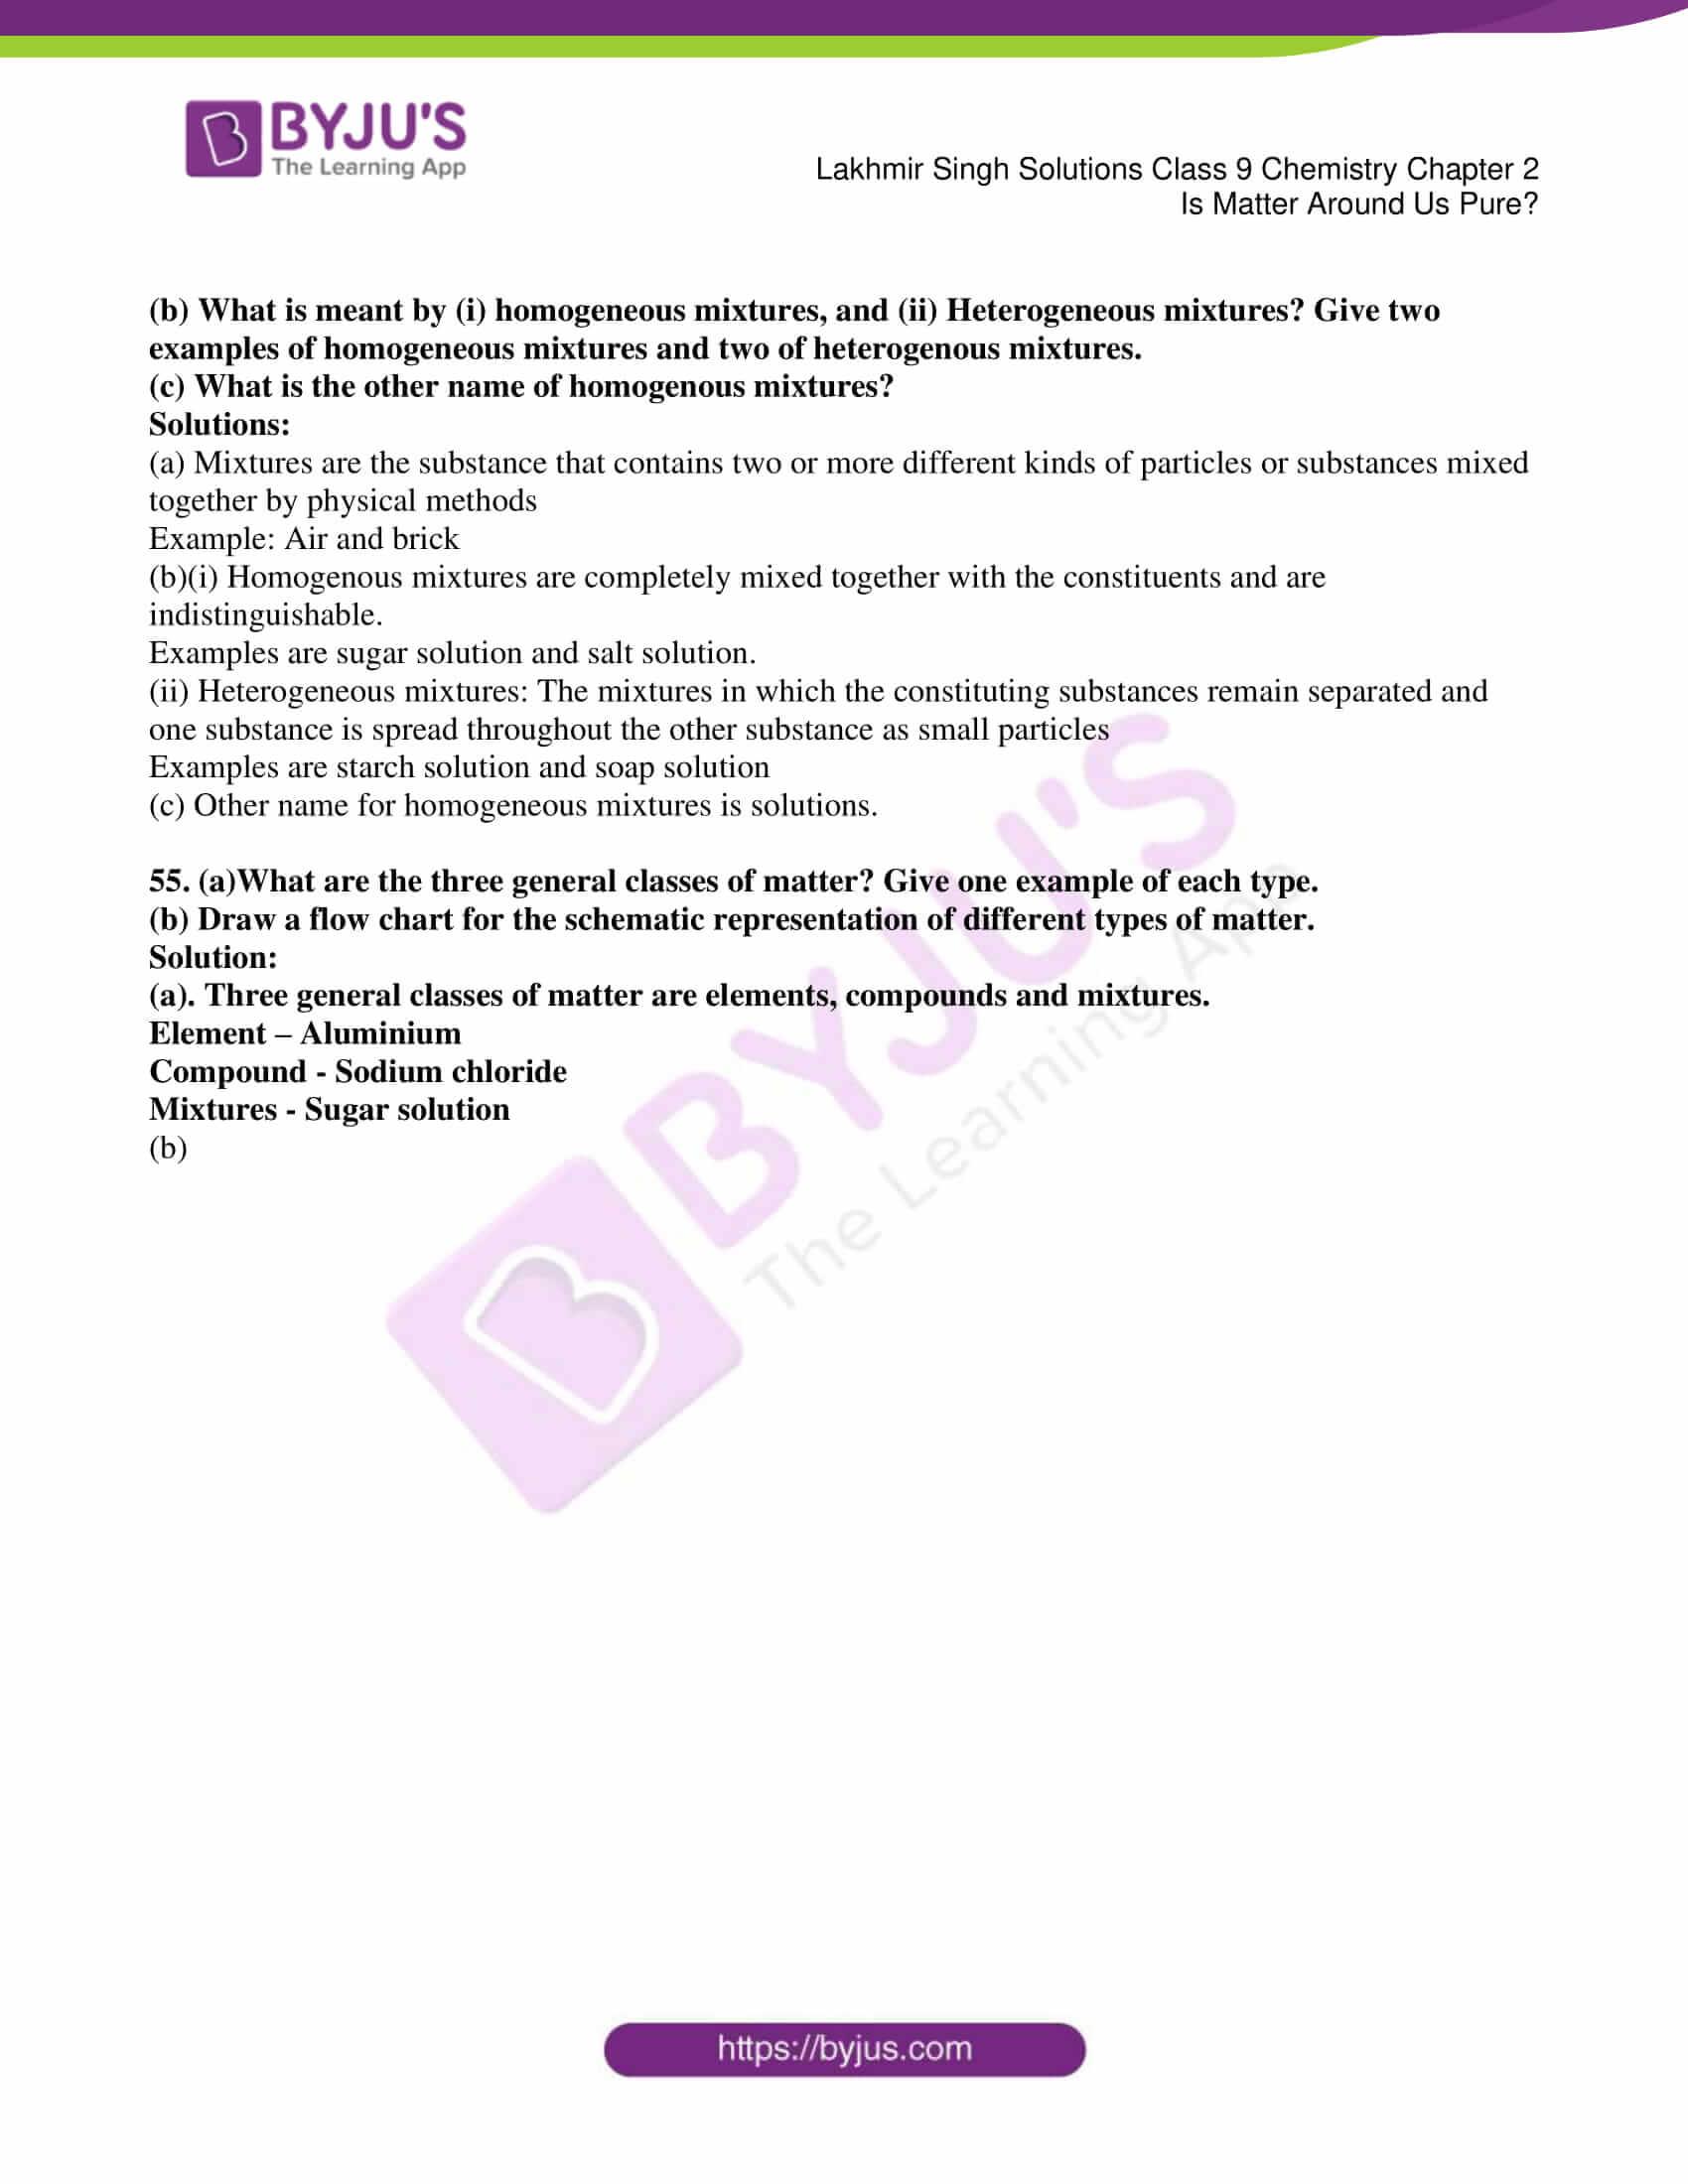 lakhmir singh solutions class 9 chemistry chapter 2 10